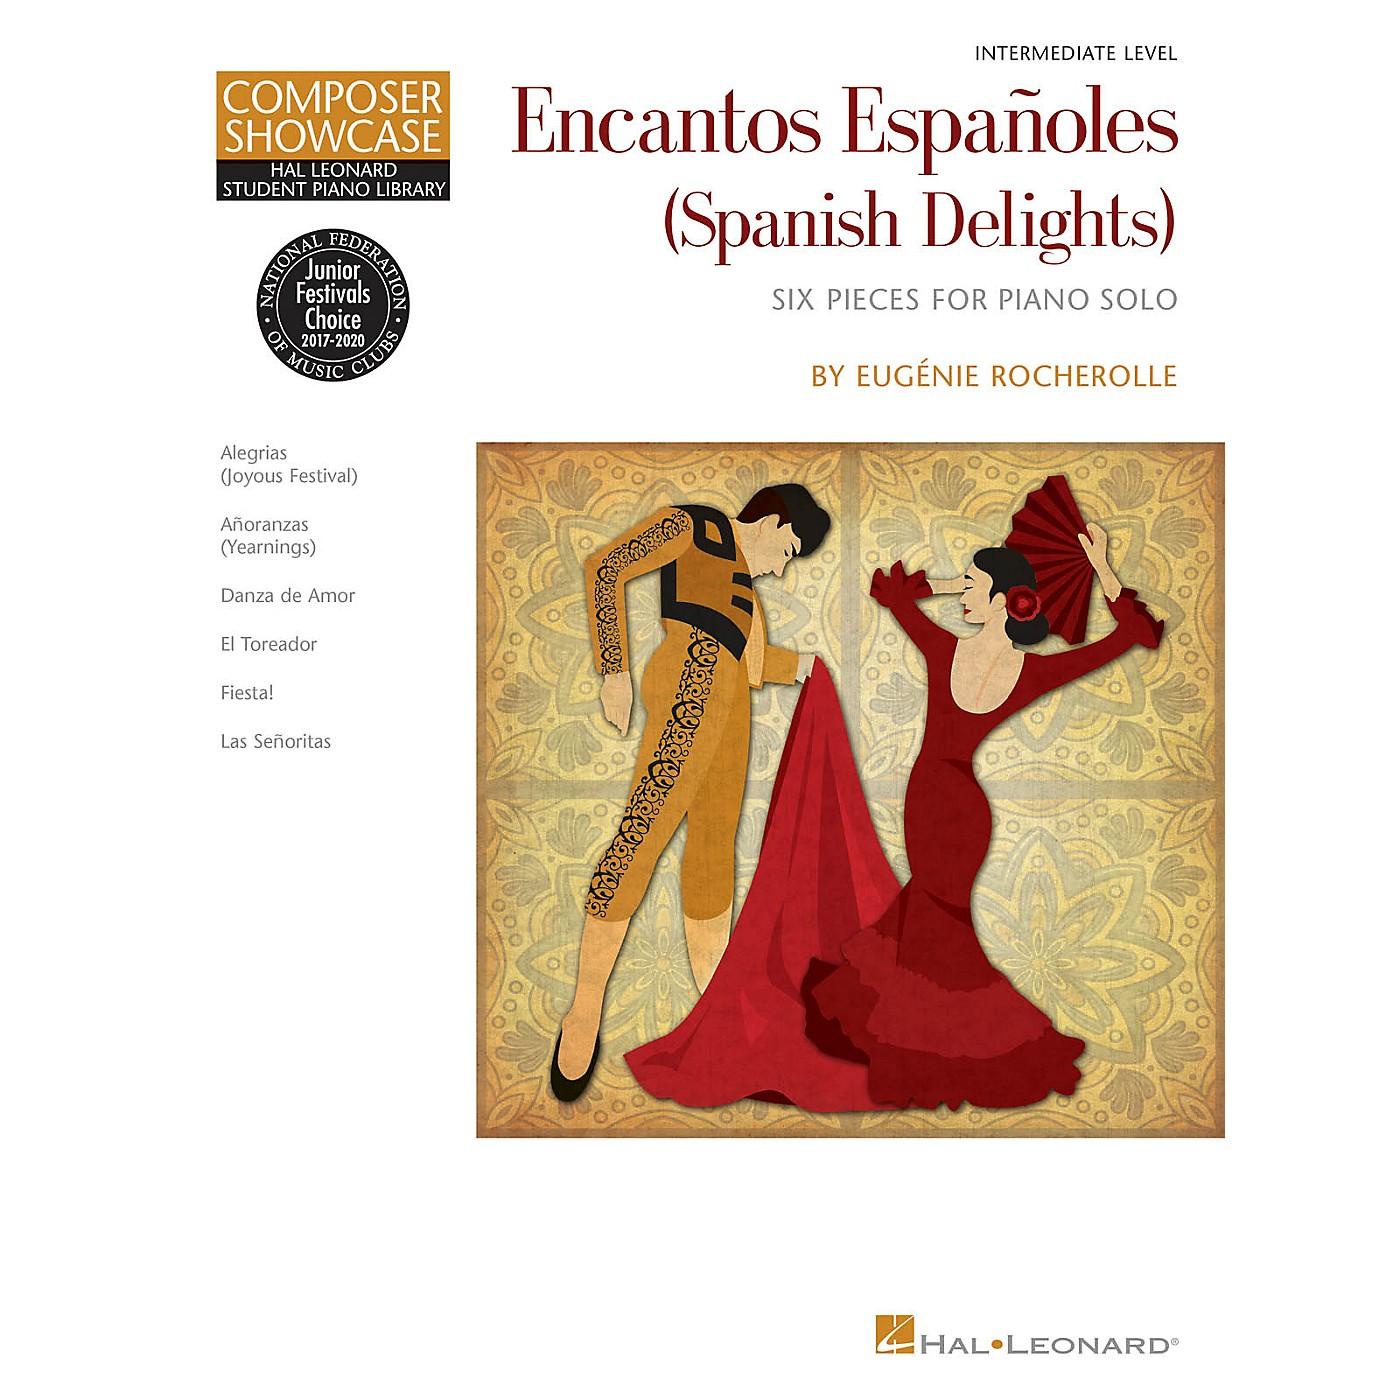 Hal Leonard Encantos Españoles (Spanish Delights) Piano Library Series Book by Eugénie Rocherolle (Intermediate) thumbnail